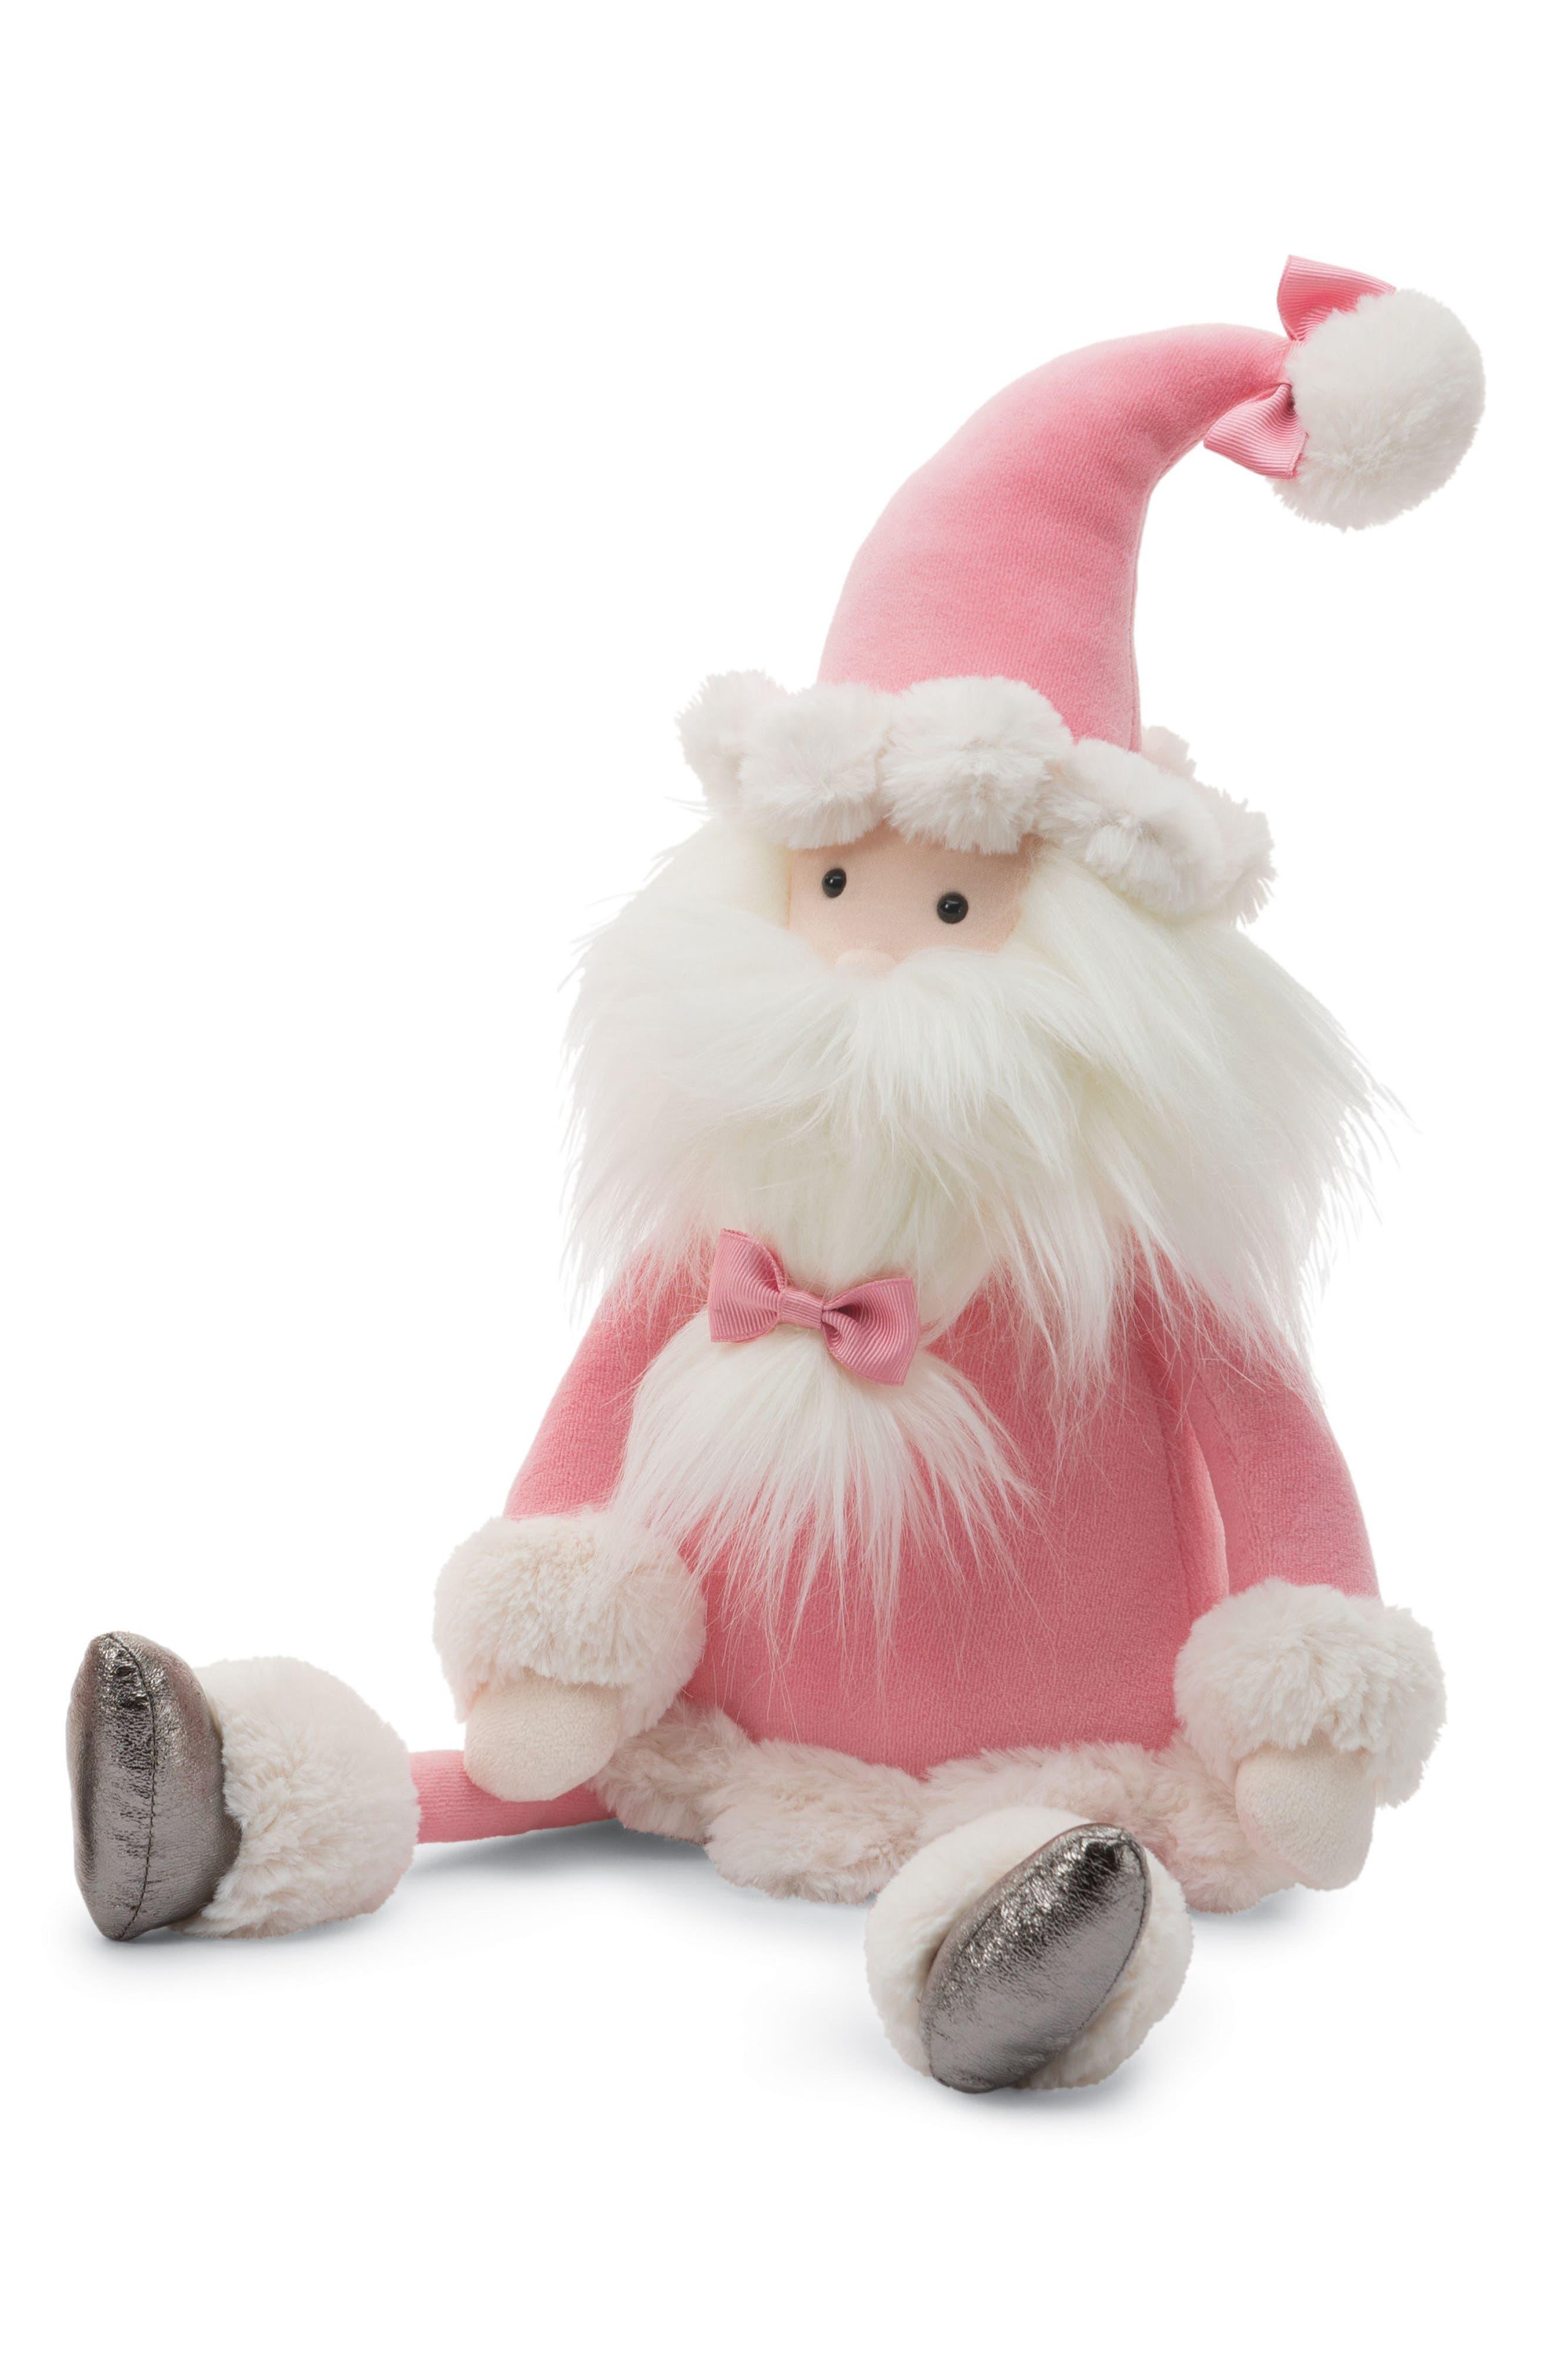 Main Image - Jellycat Medium Splendid Santa Stuffed Doll